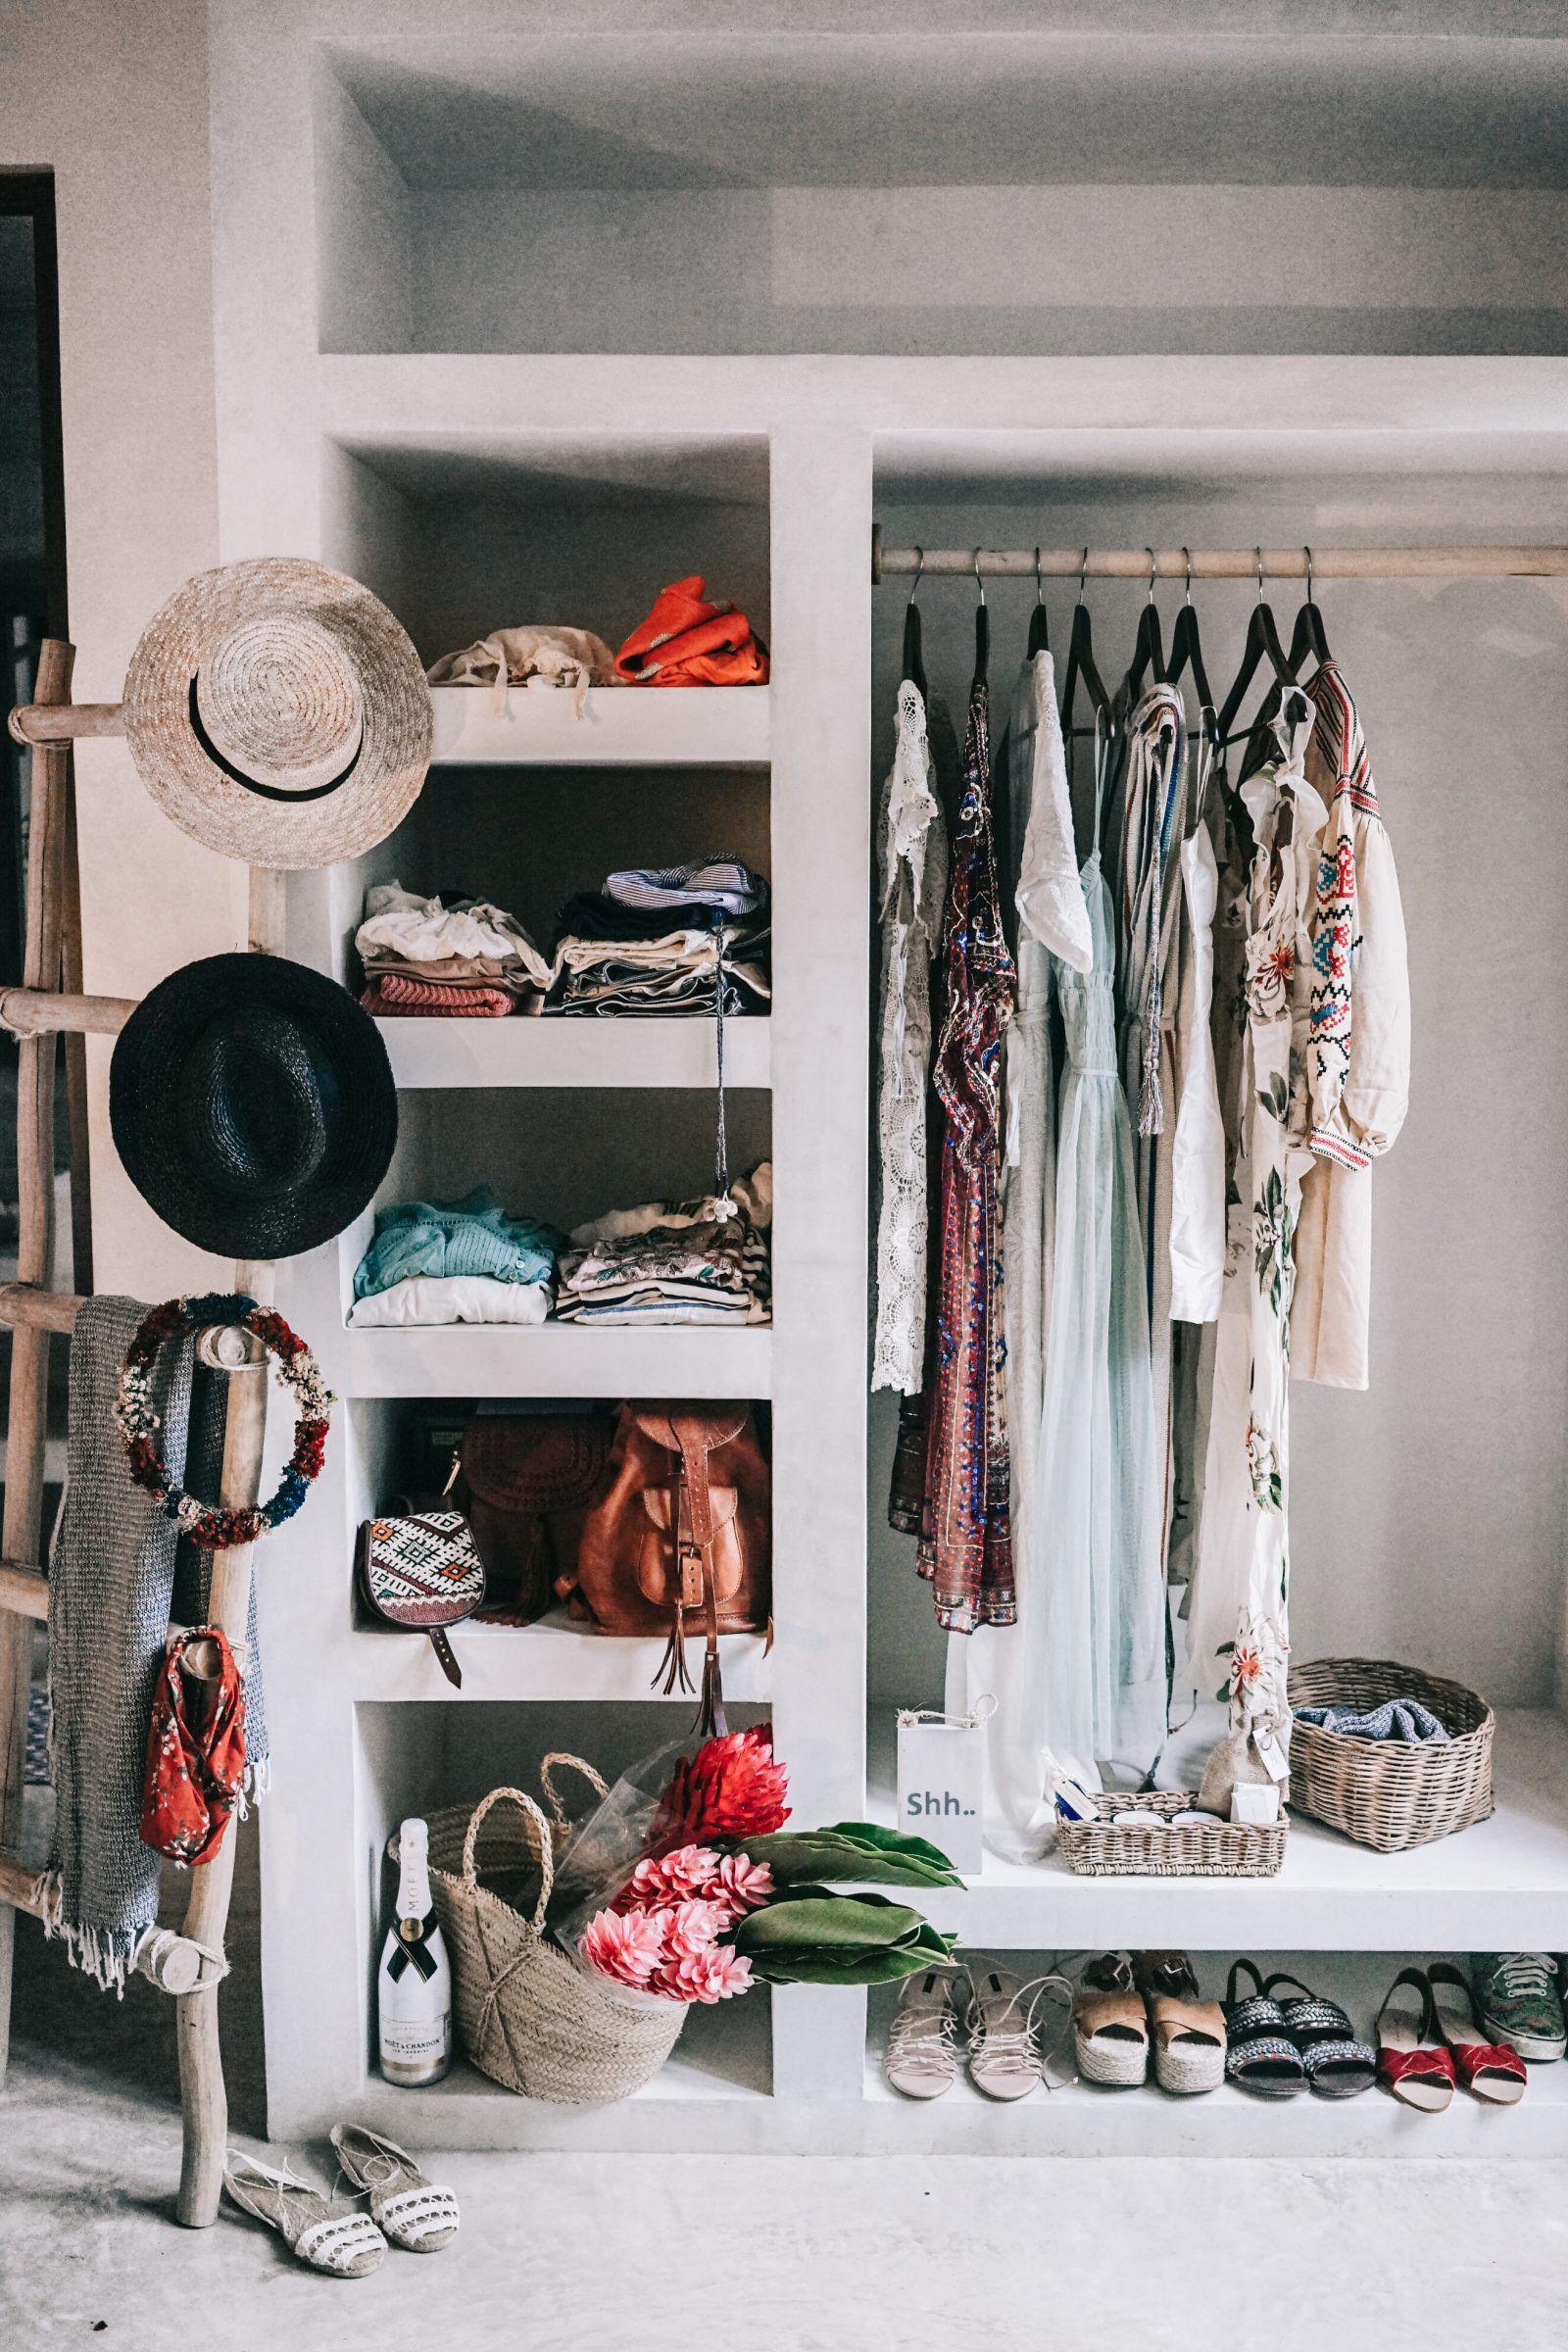 Pin de @thesaradventures en Deco | Home Decor, Closet